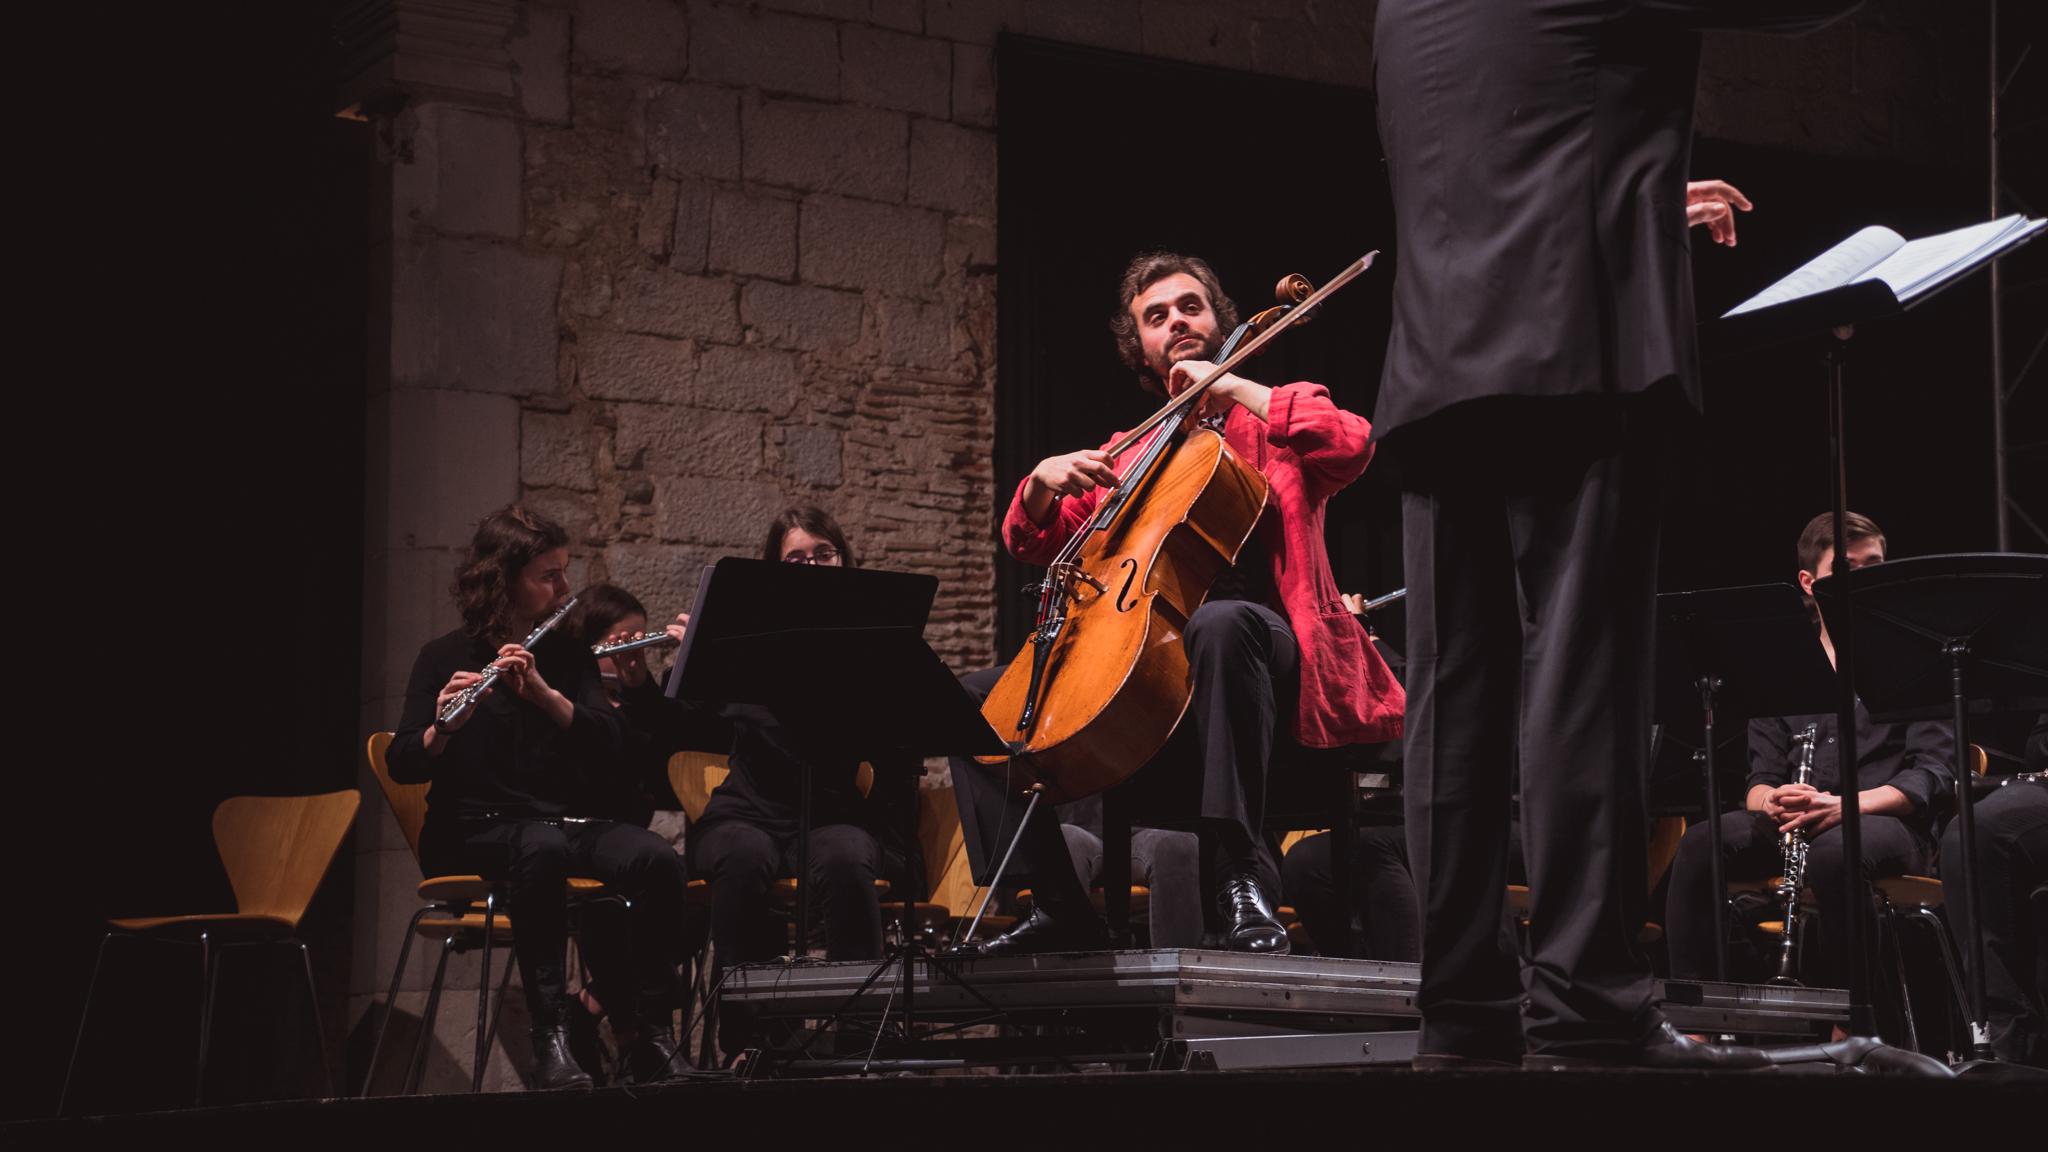 Ramon Bassal - Cello